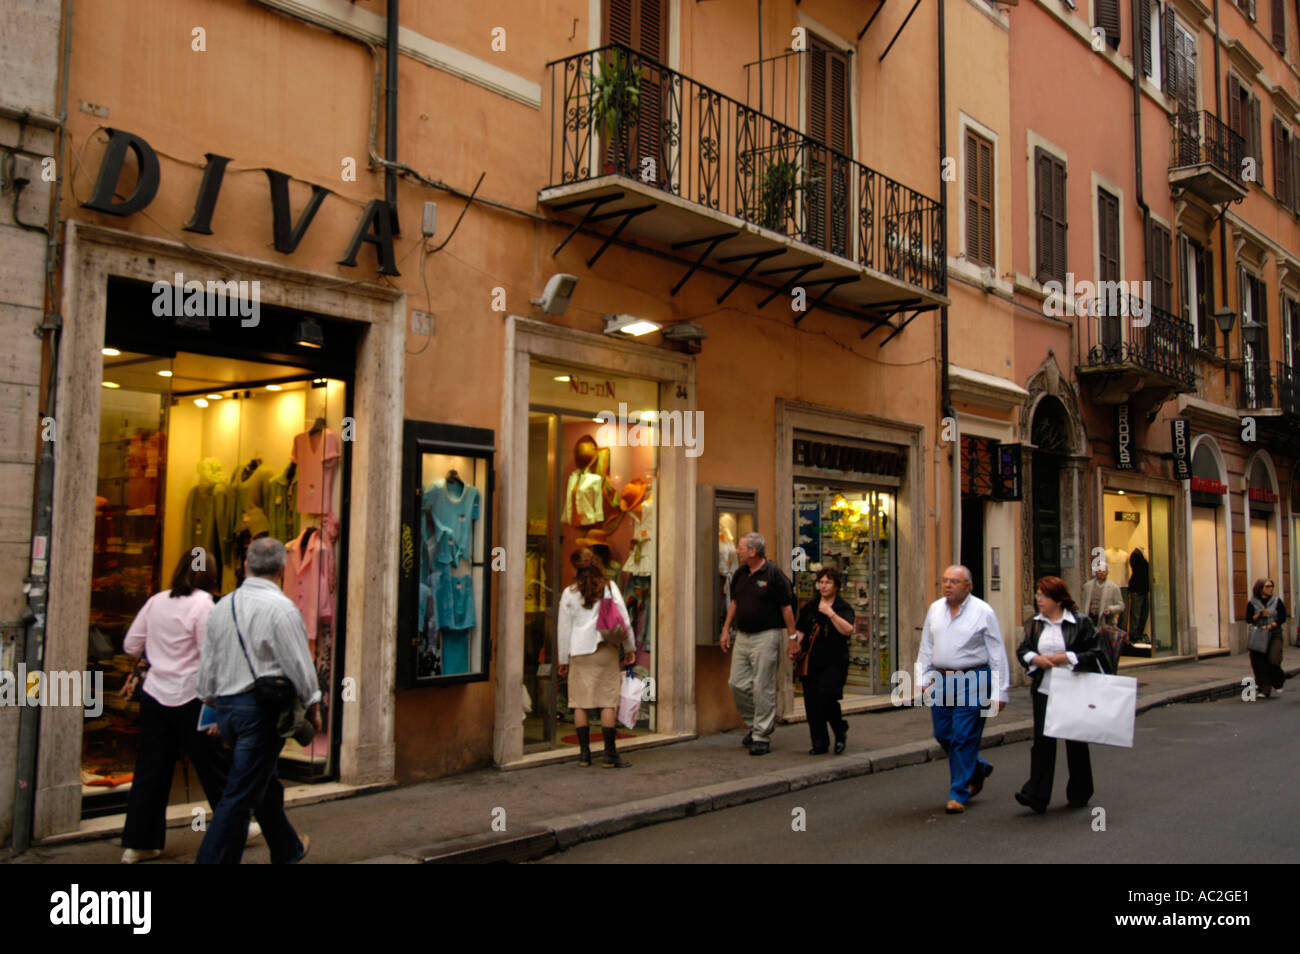 Shopping on via del corso rome italy stock photo 4249824 for Bershka roma via del corso